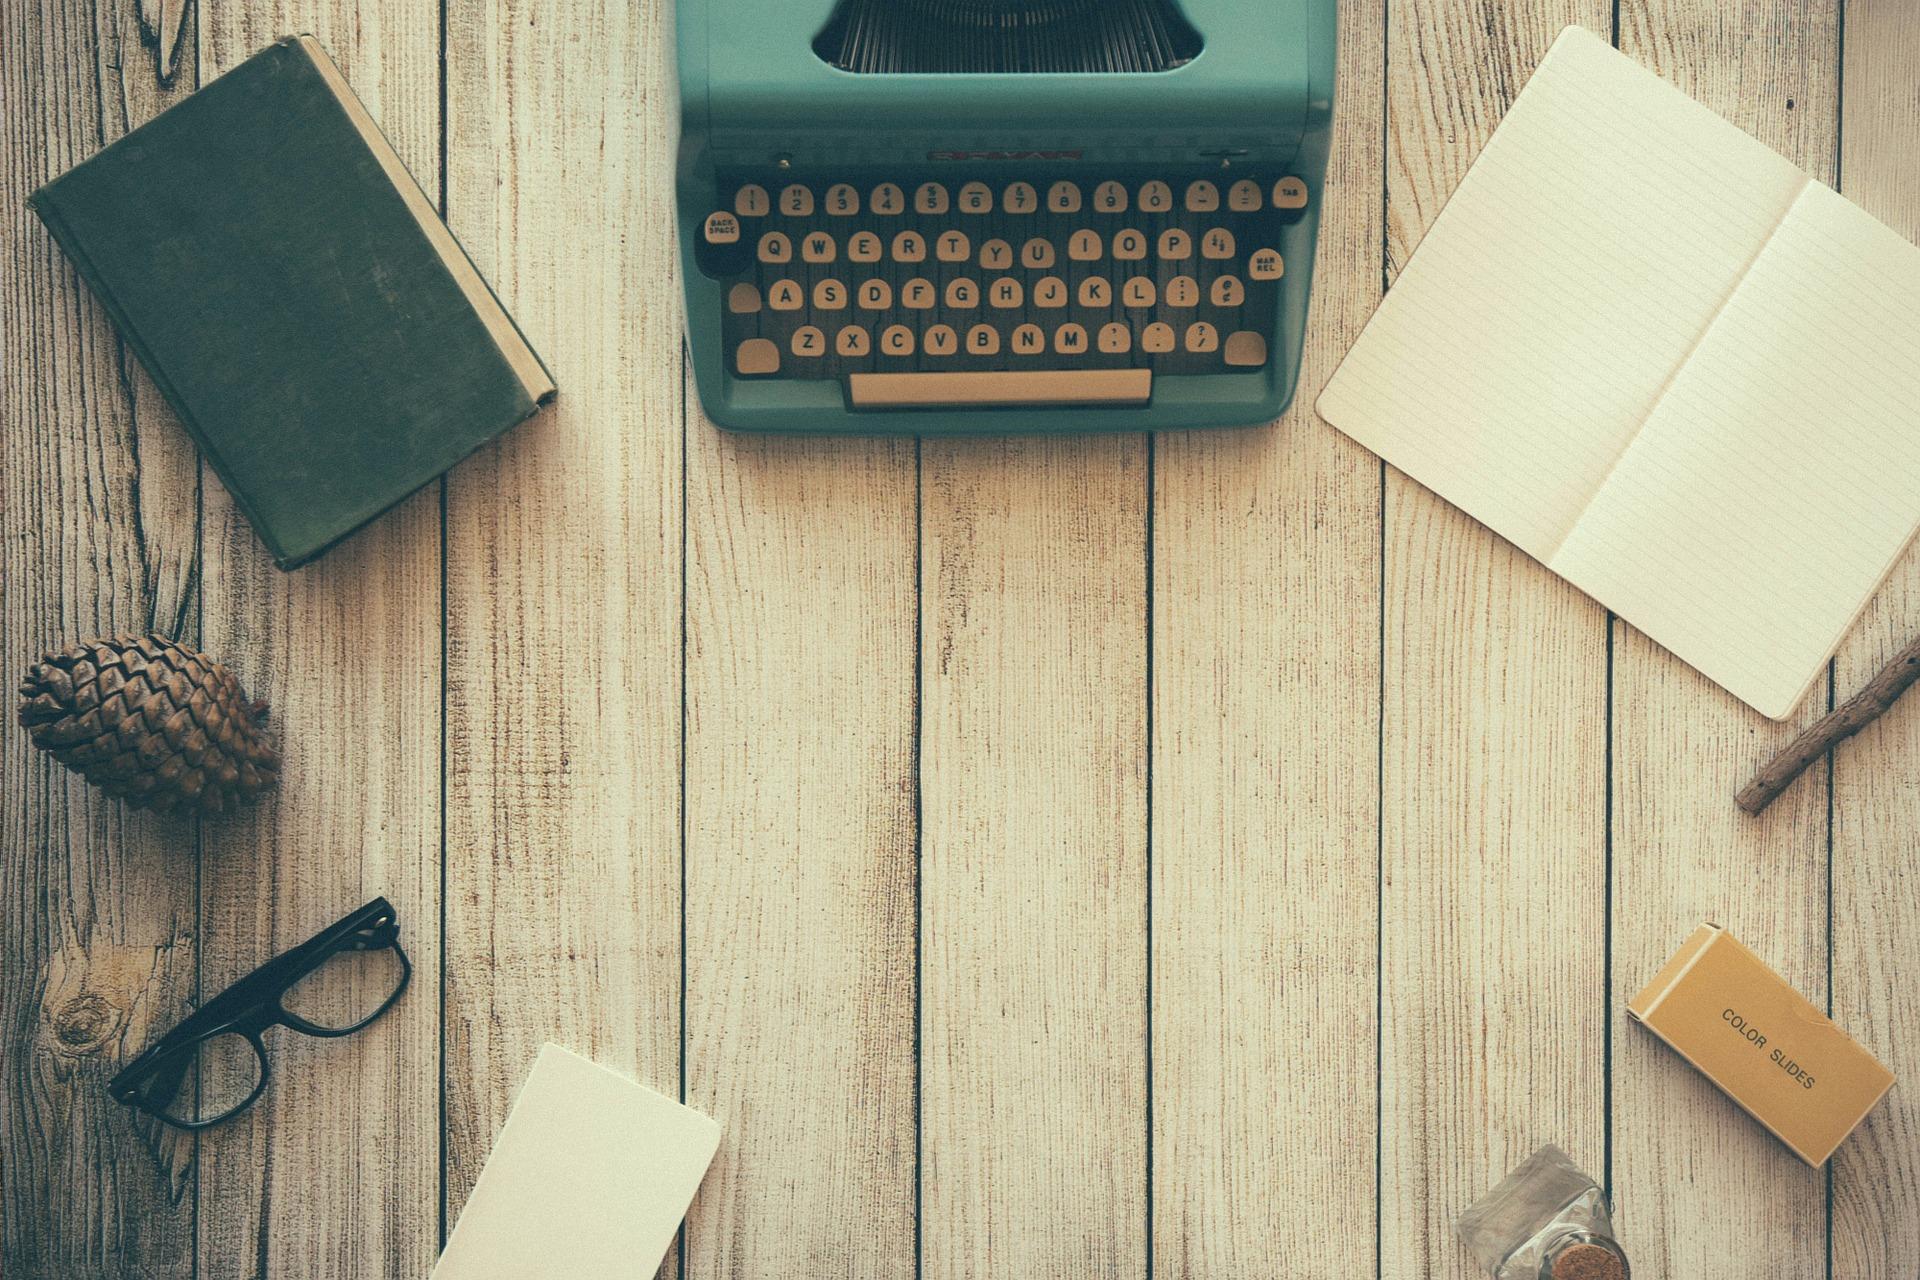 https://www.copycruncher.com/wp-content/uploads/2016/08/typewriter-801921_1920.jpg